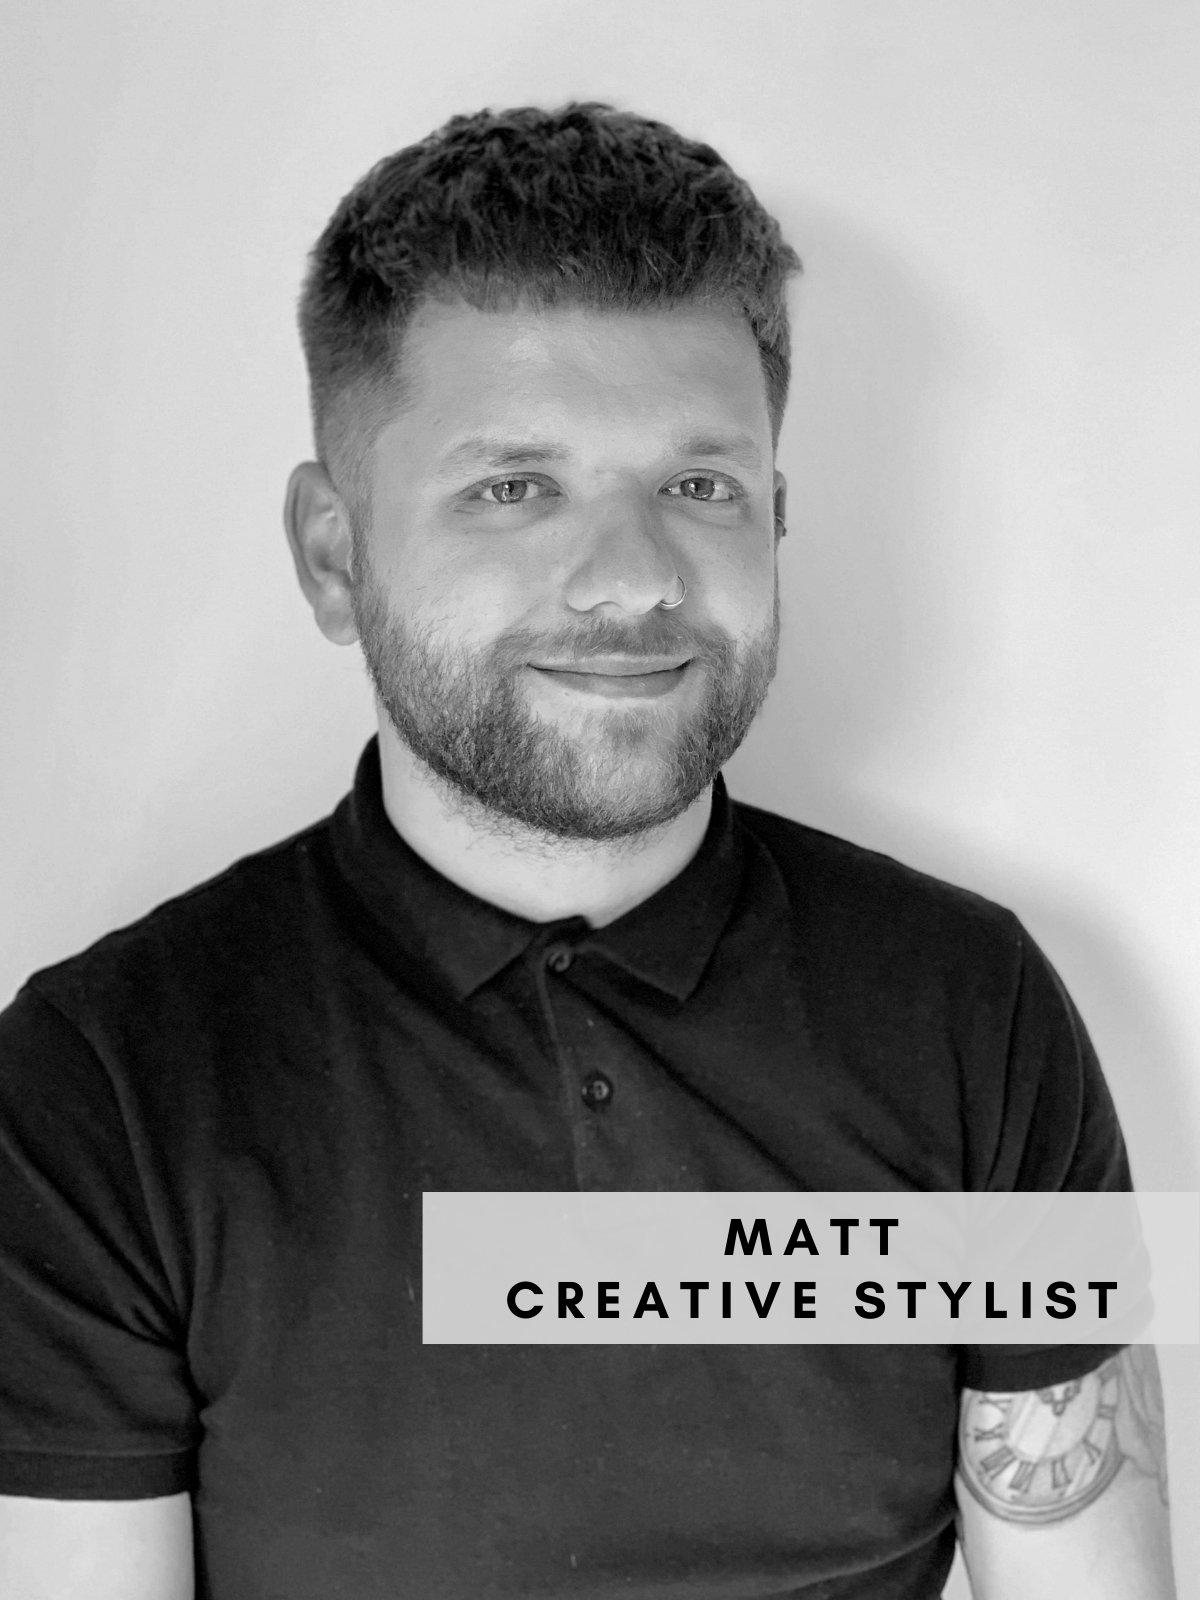 Matt – Creative Stylist